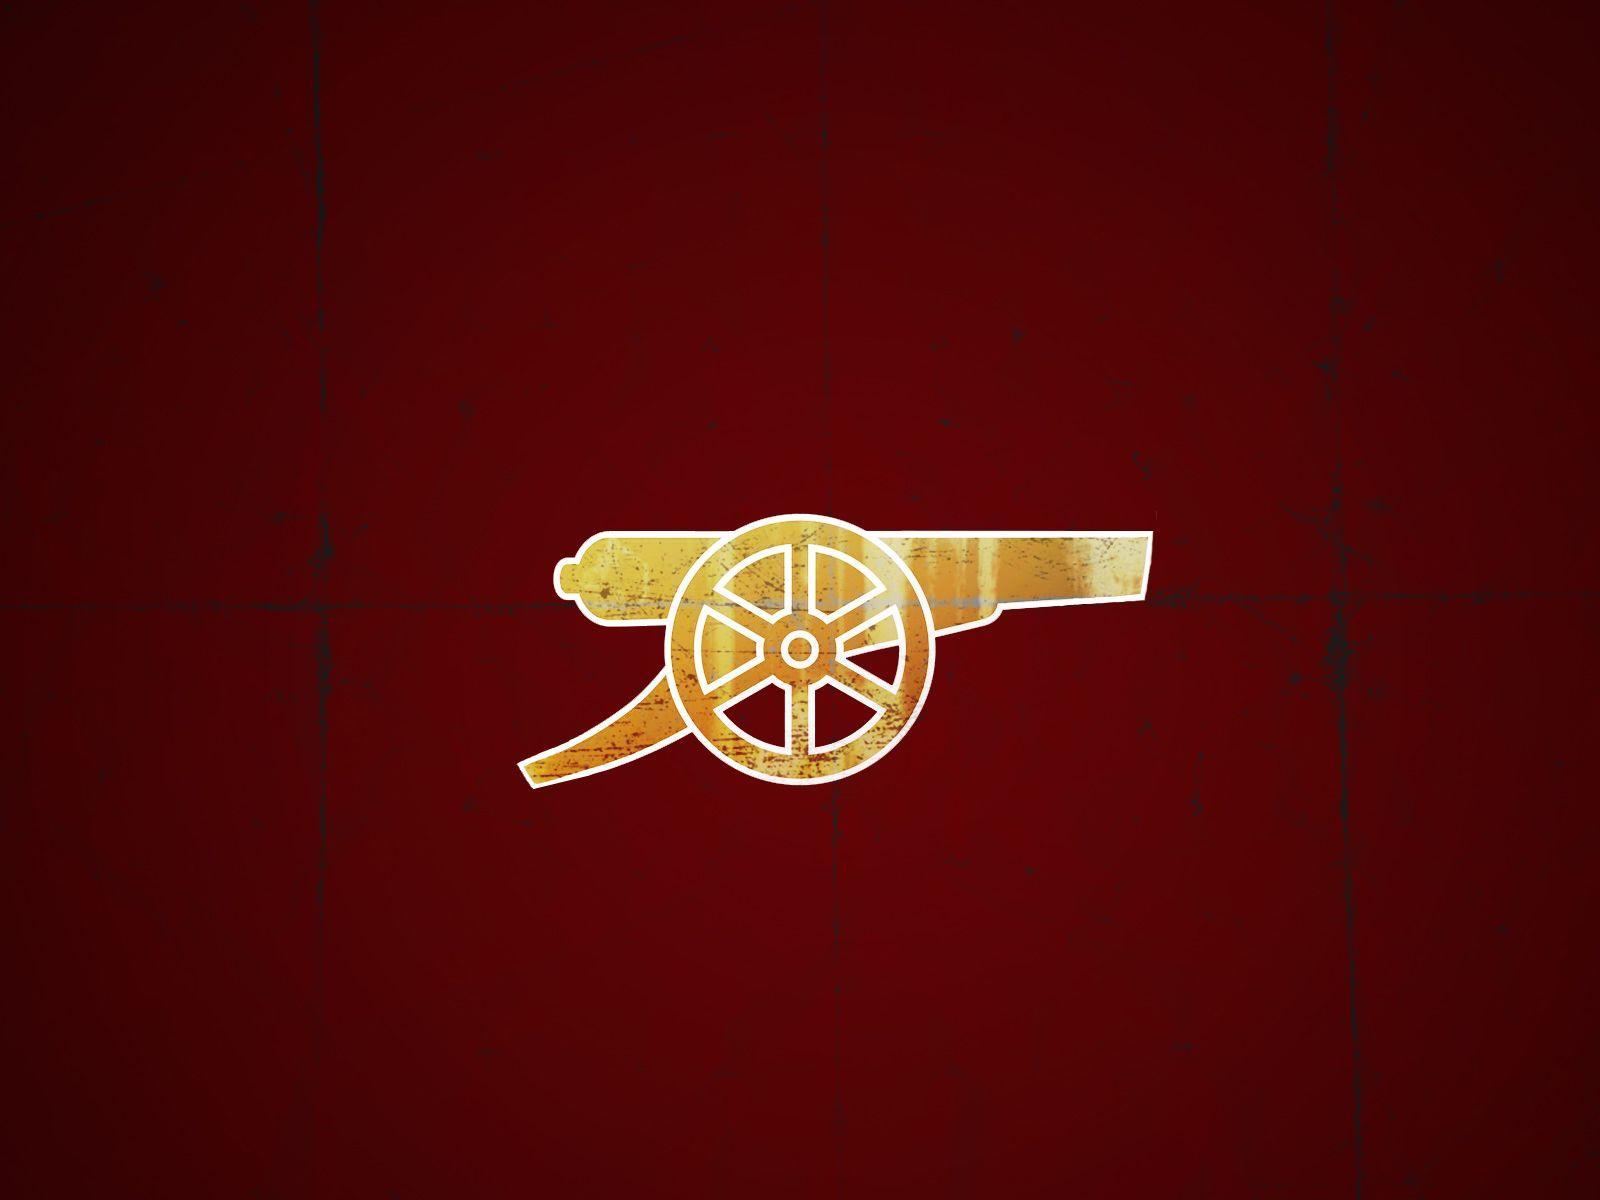 arsenal logo desktop wallpapers top